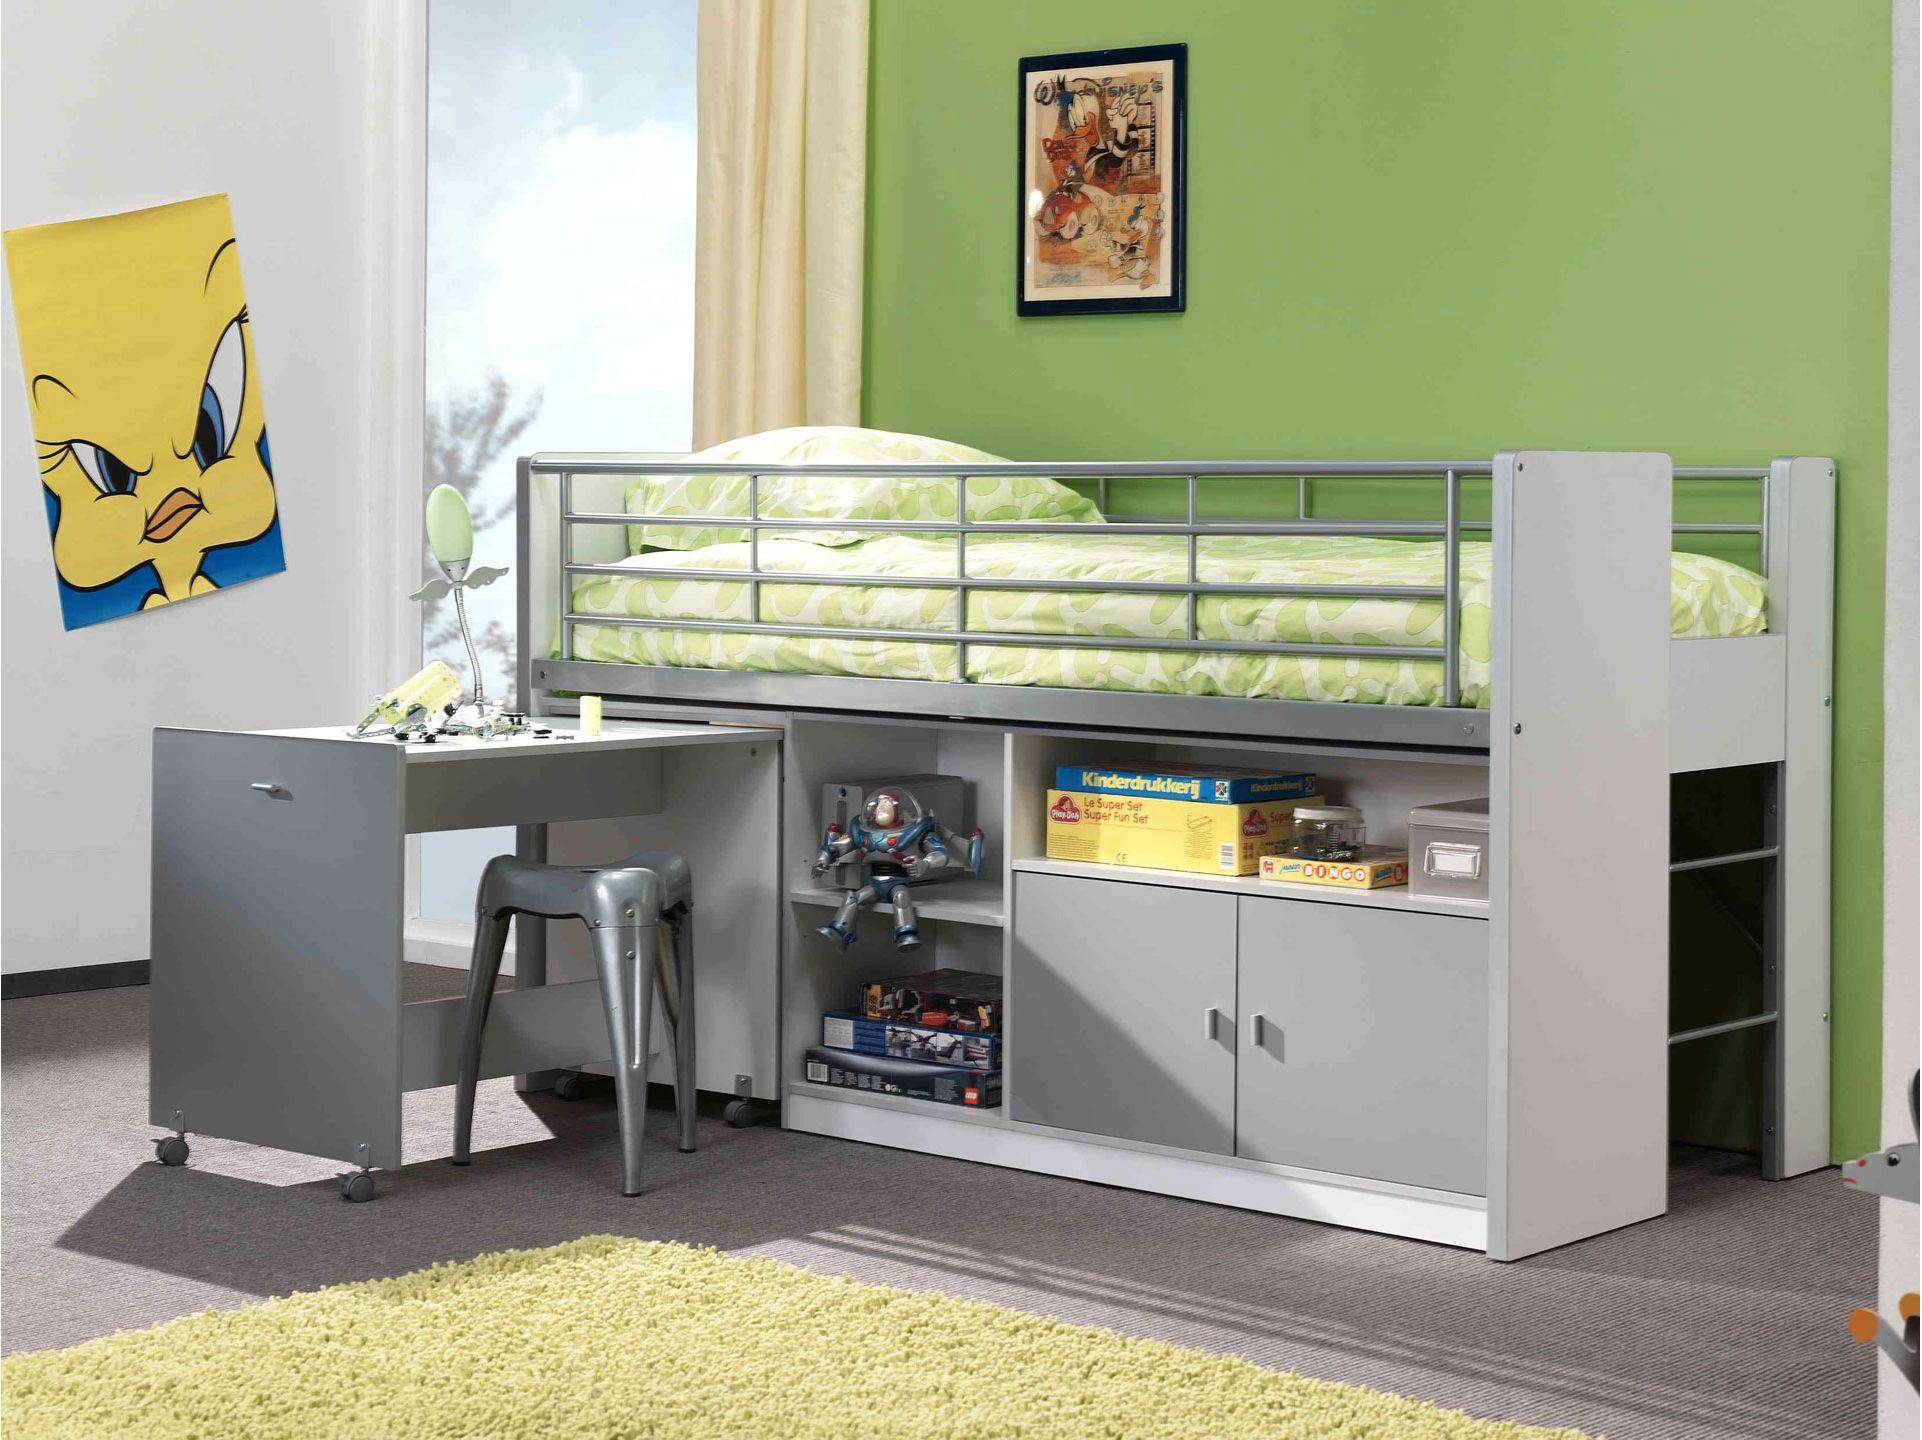 lit combine enfant combi silver compact loft beds for kids pinterest. Black Bedroom Furniture Sets. Home Design Ideas